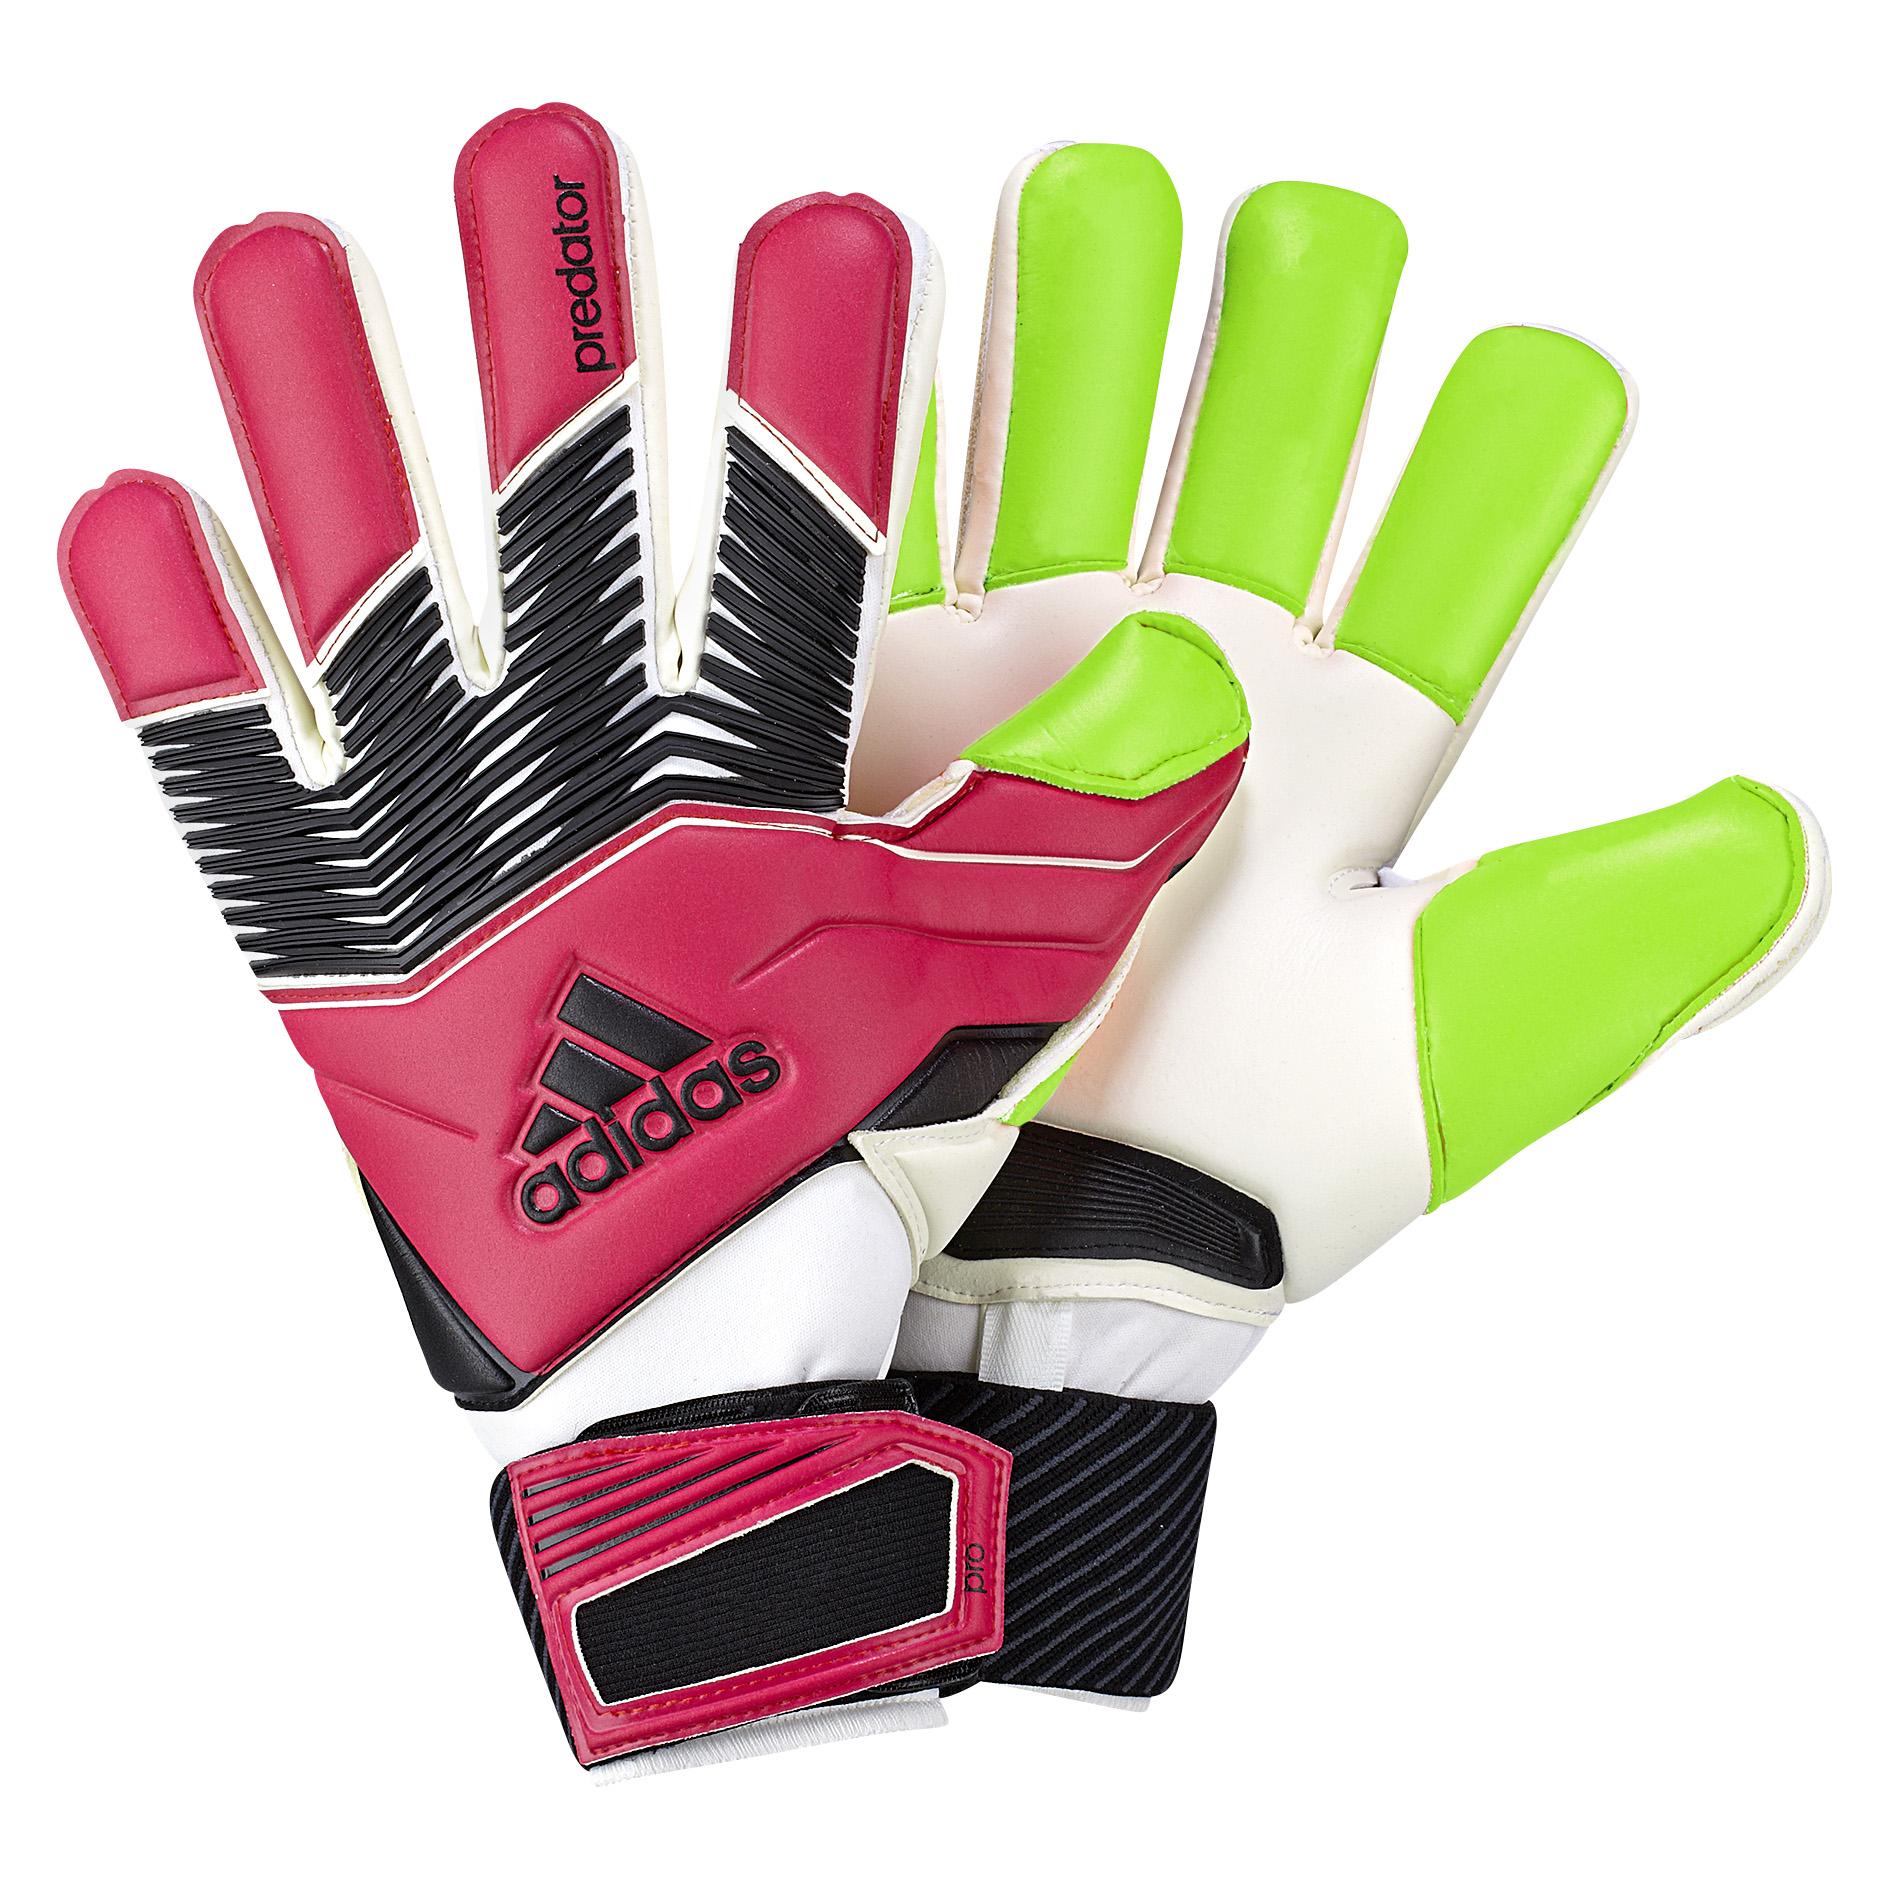 Adidas Predator Z Pro Iker Casillas Goalkeeper Glove Pink